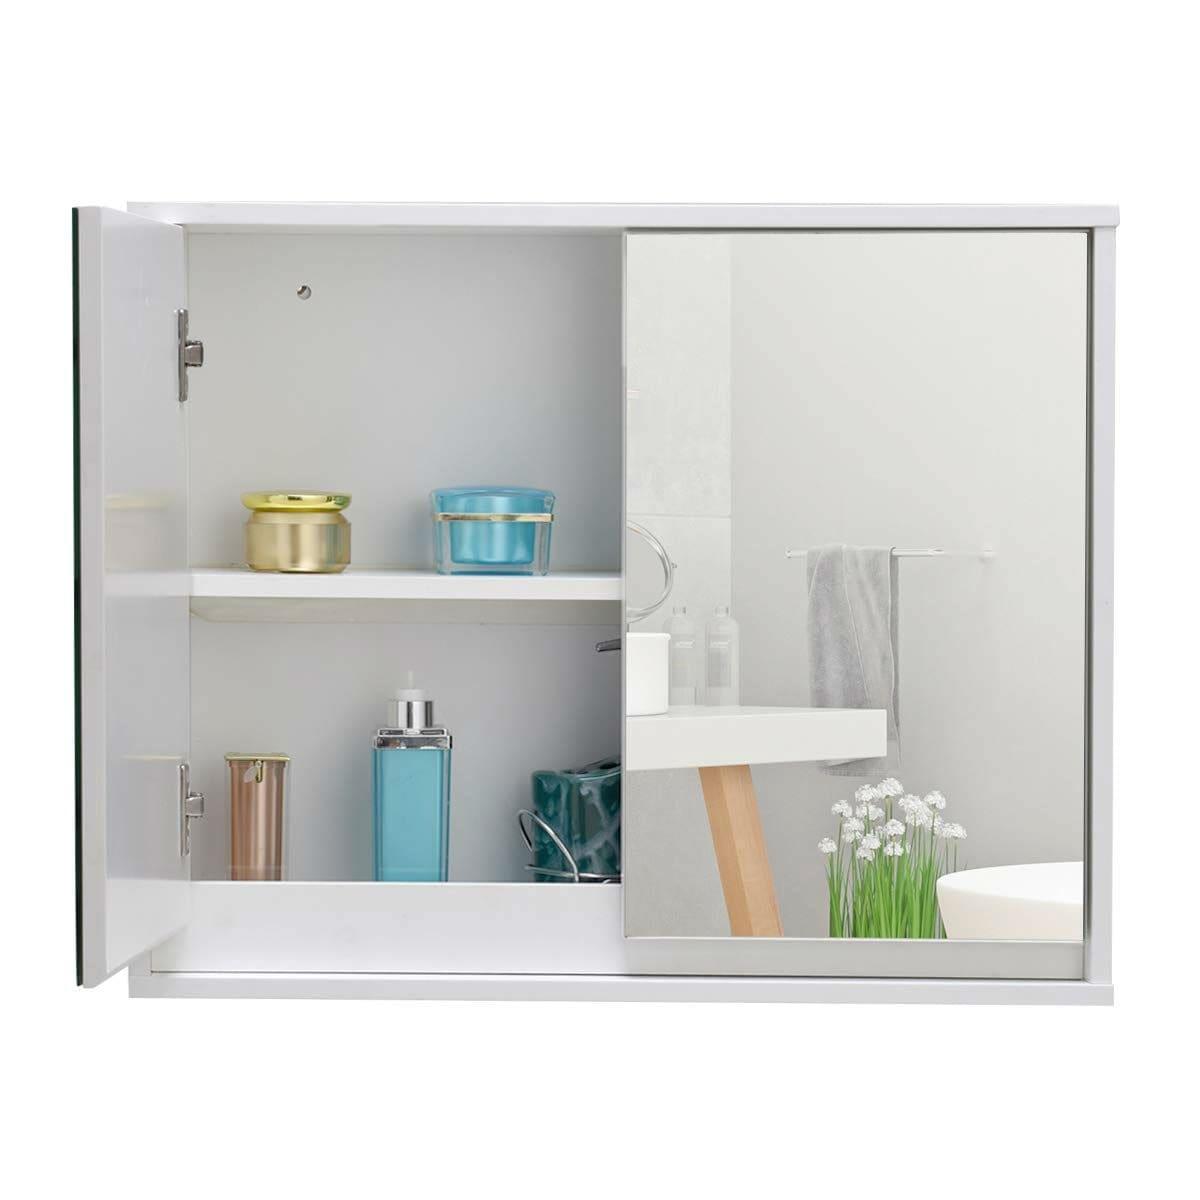 Modern 22 X 18 Inch Bathroom Wall Mirror Medicine Cabinet 22 X5 5 X18 L X W X H Overstock 29084504